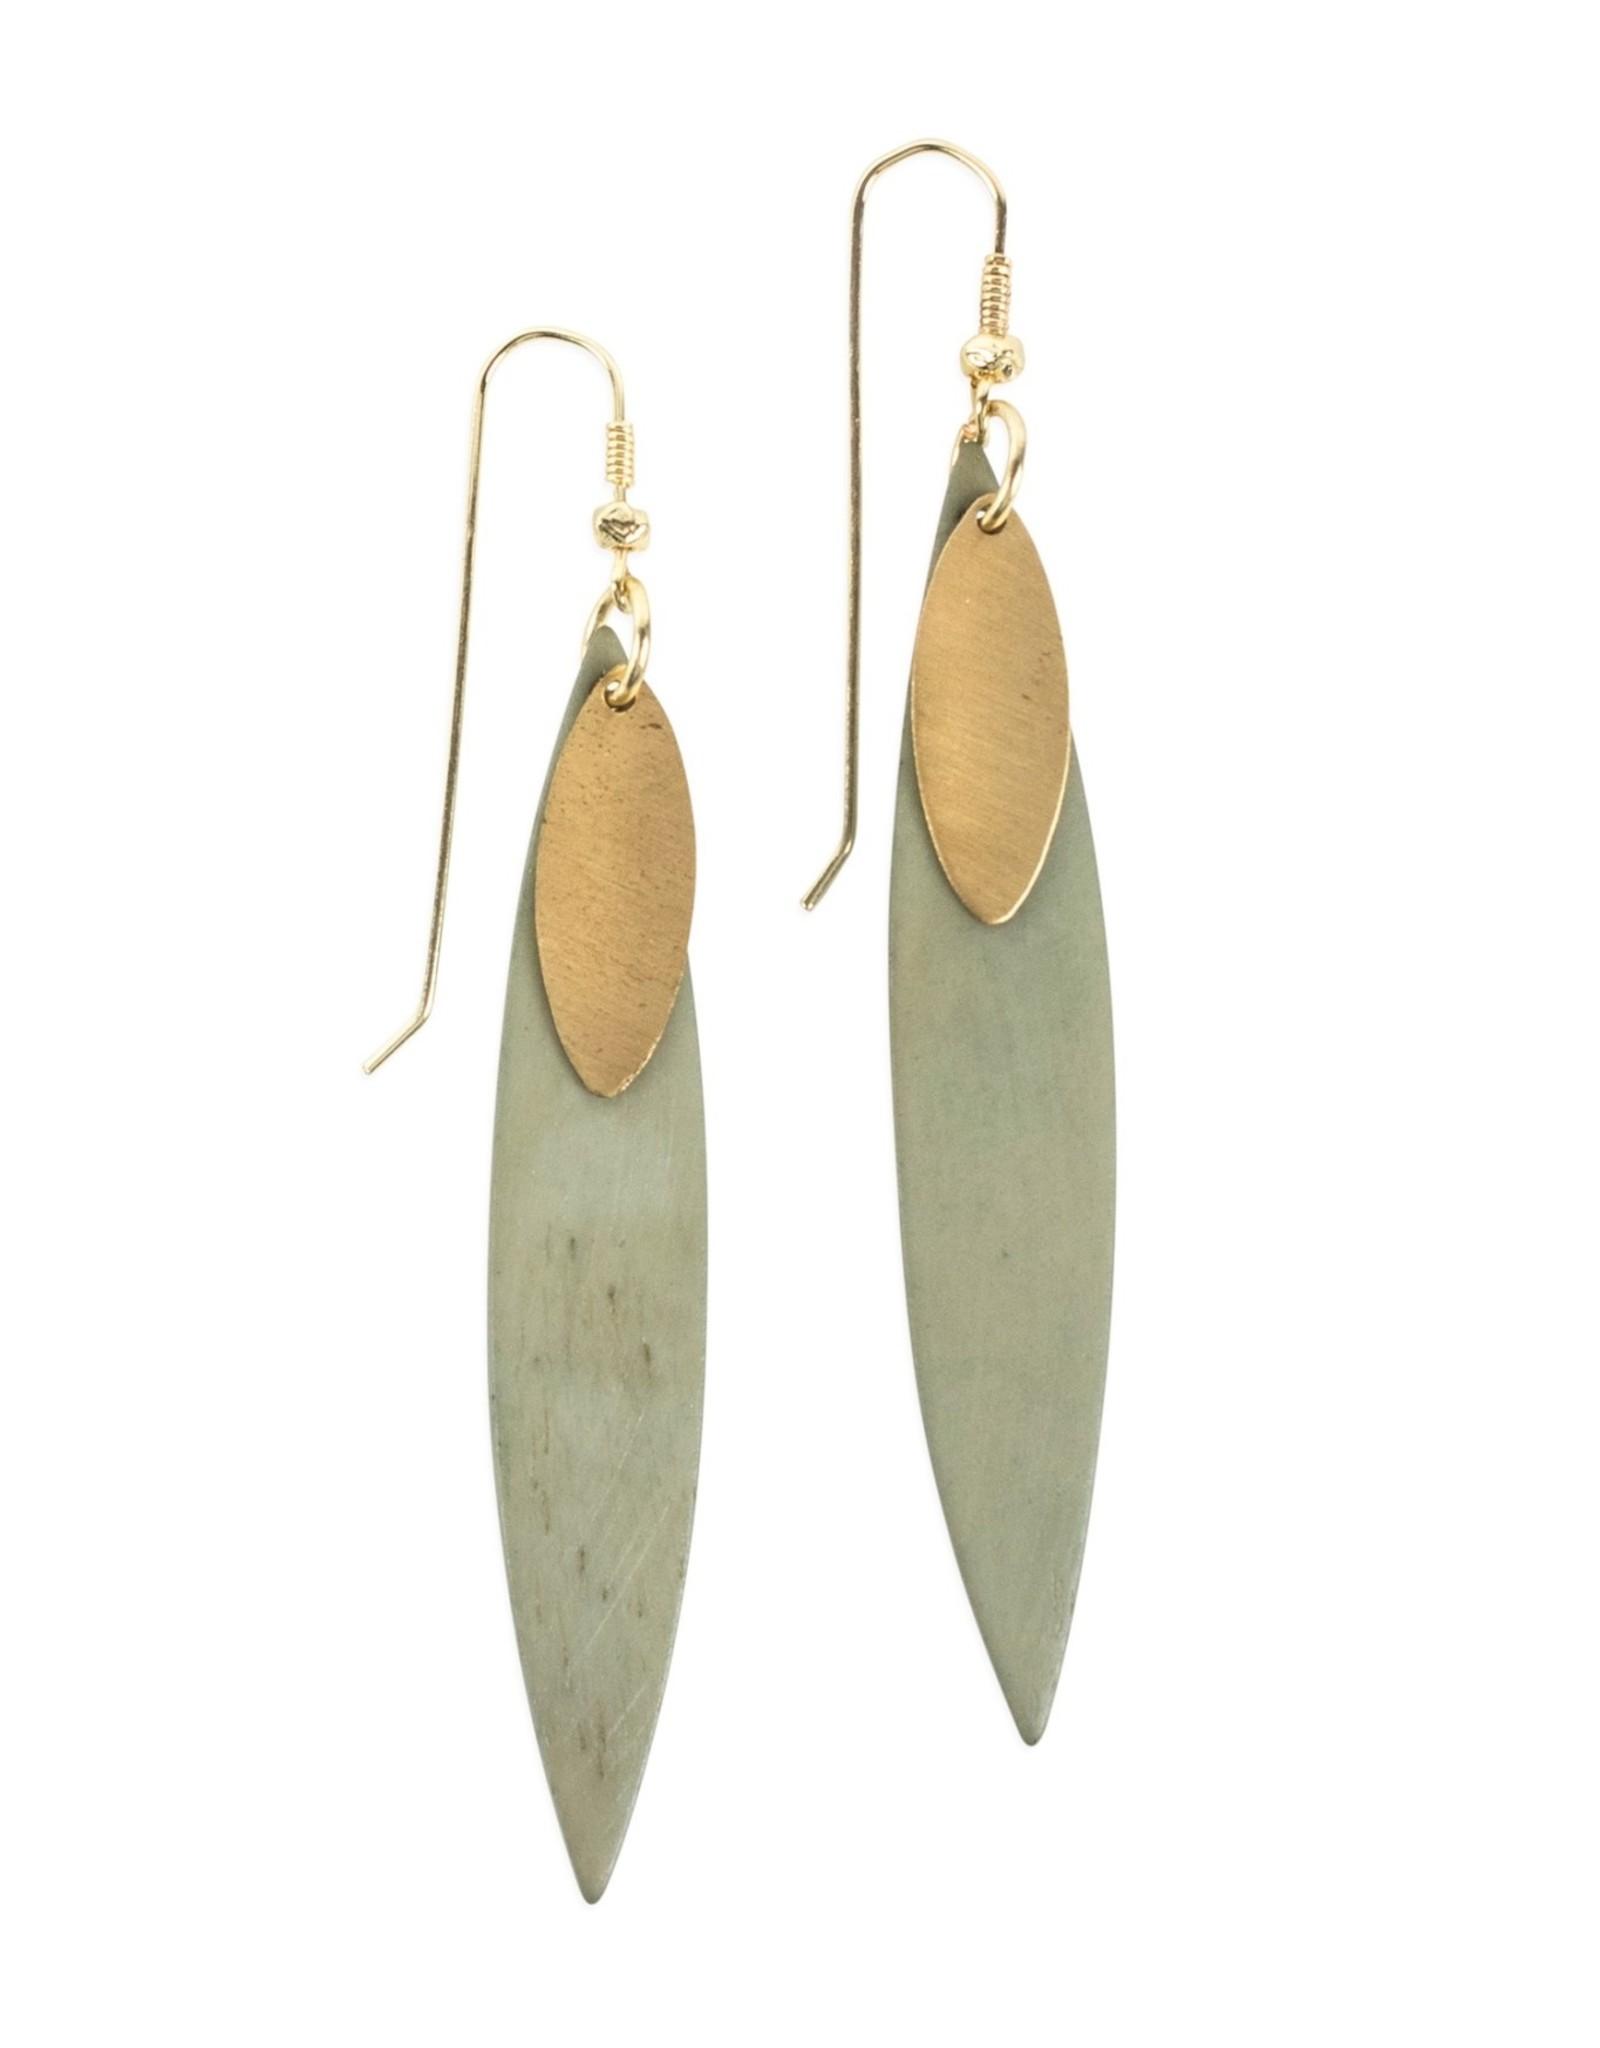 India, Delicate Edge Earrings